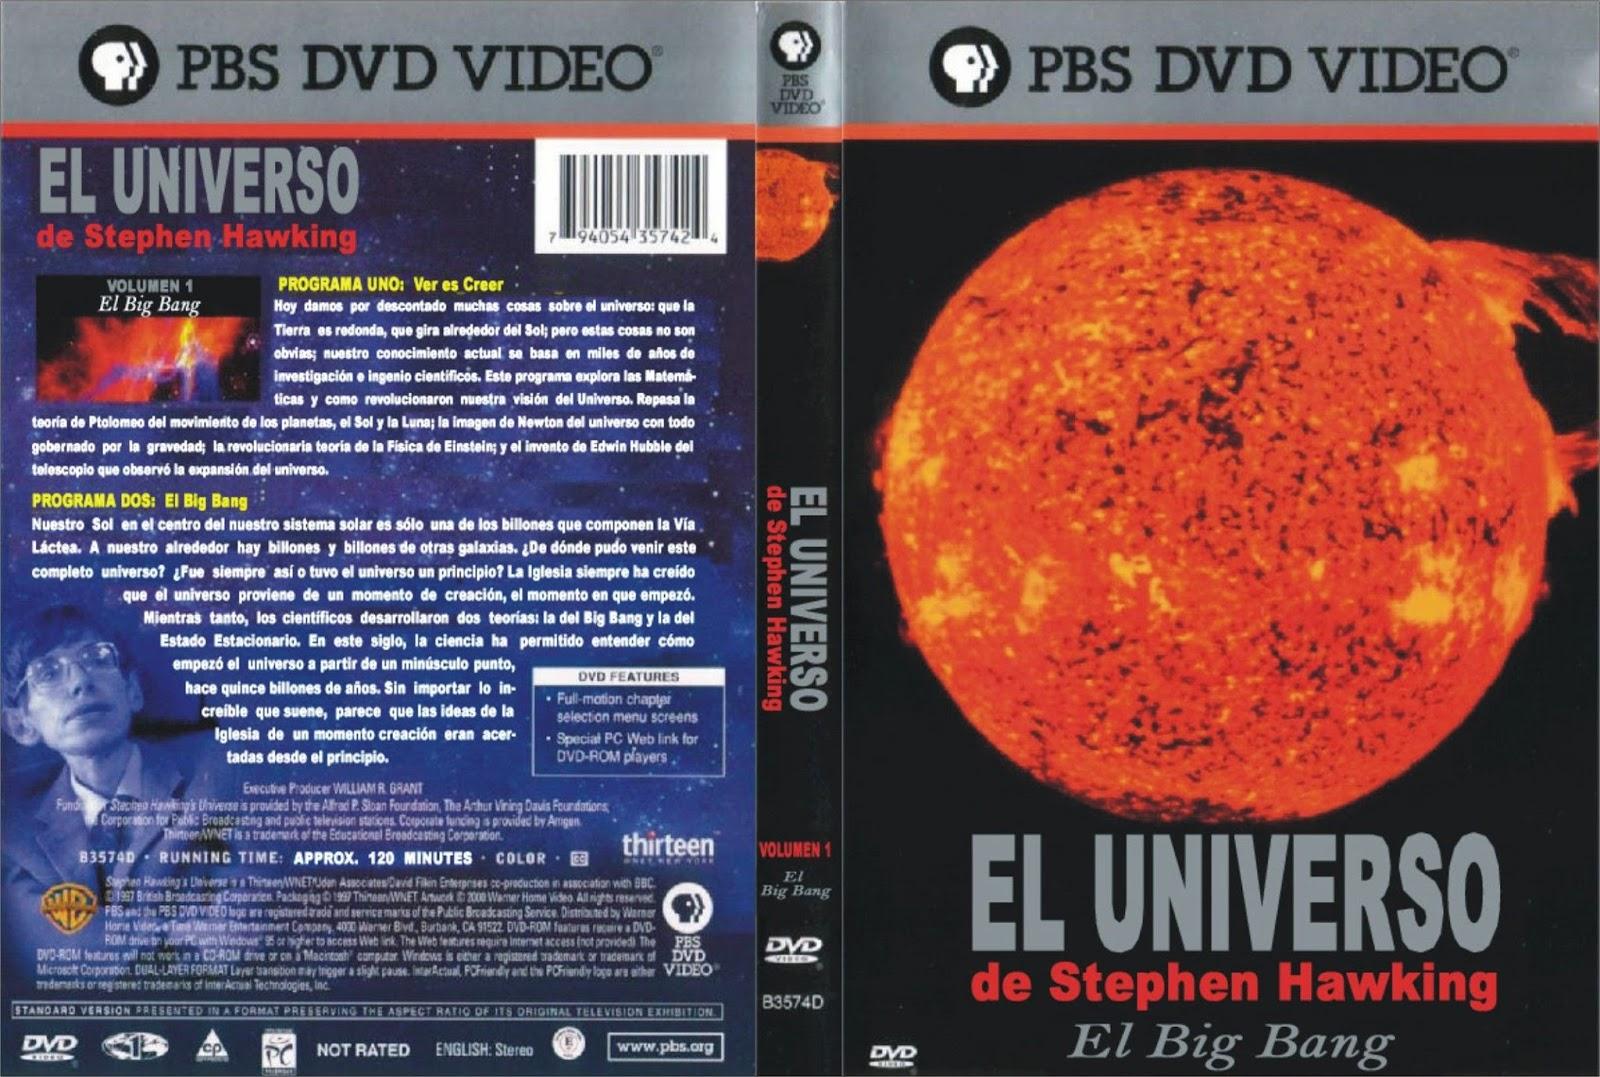 Descolector adulto del universo del dvd